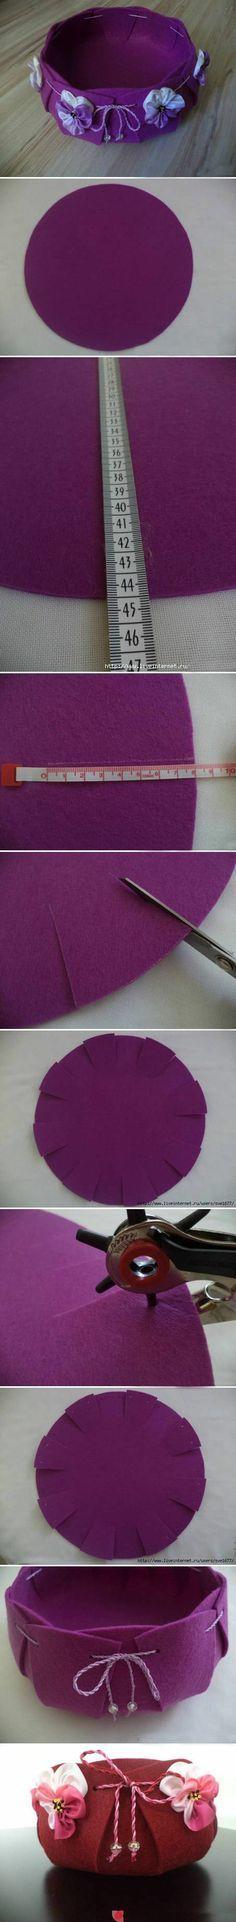 felt basket w/floral ribbon accents (photo tutorial)